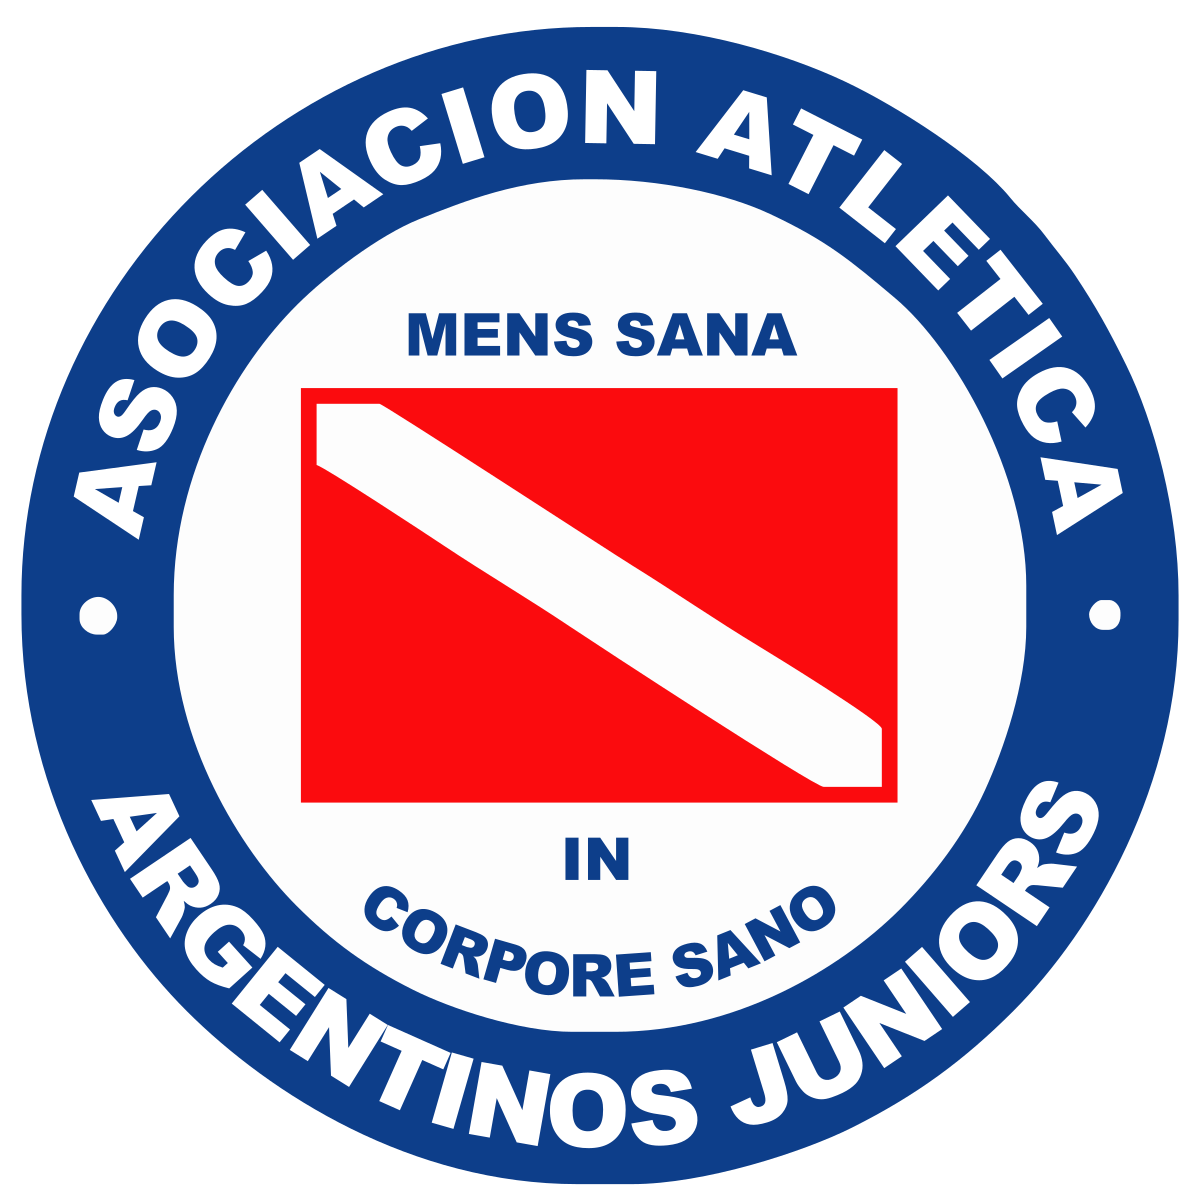 Argentinos Jrs logo